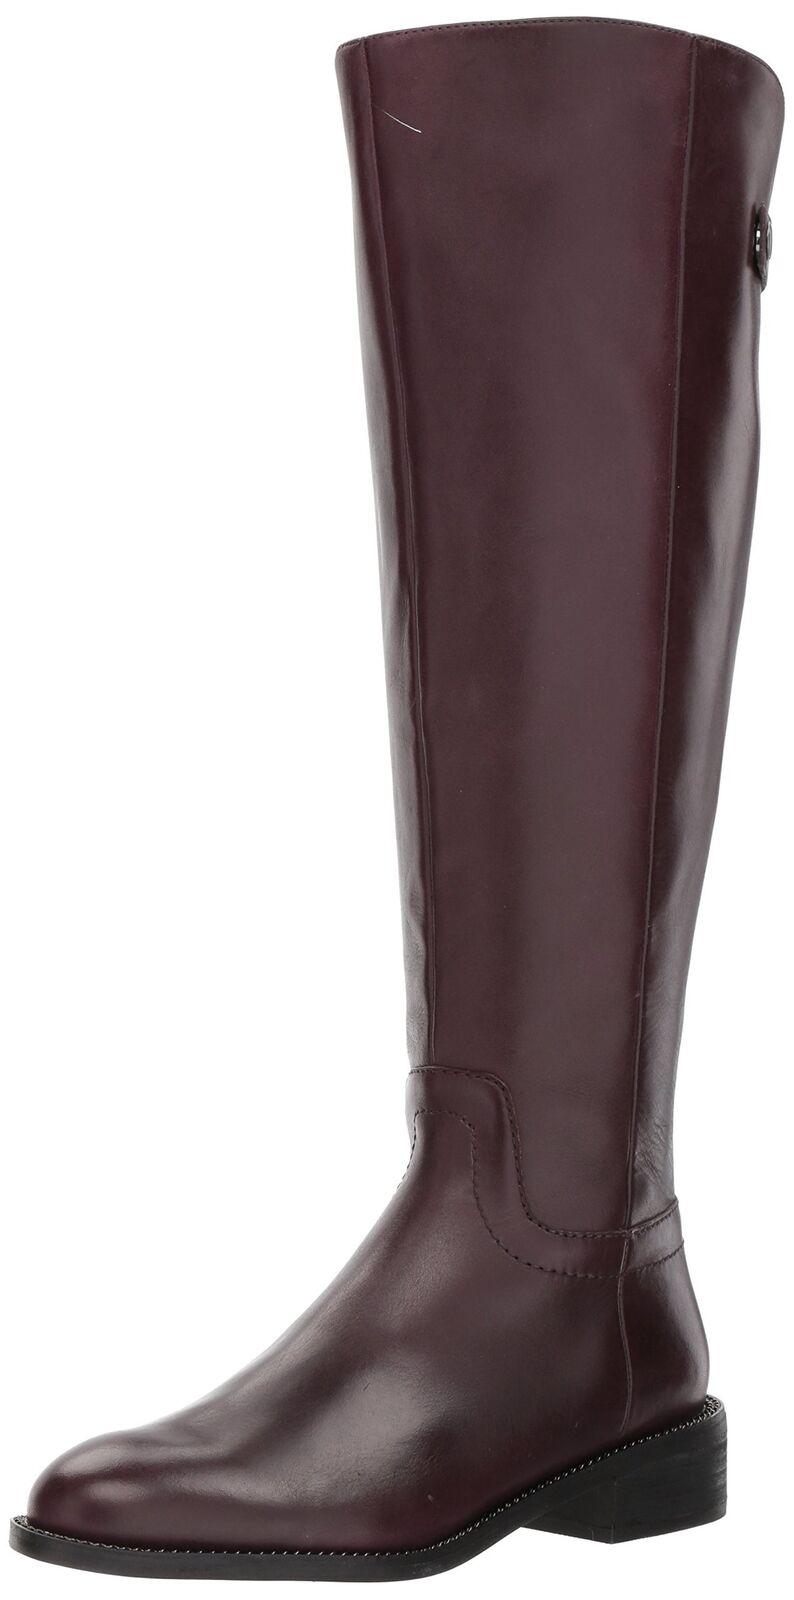 Franco Sarto Women's Brindley Wide Calf Boot, Dark Burgundy, 10 M US